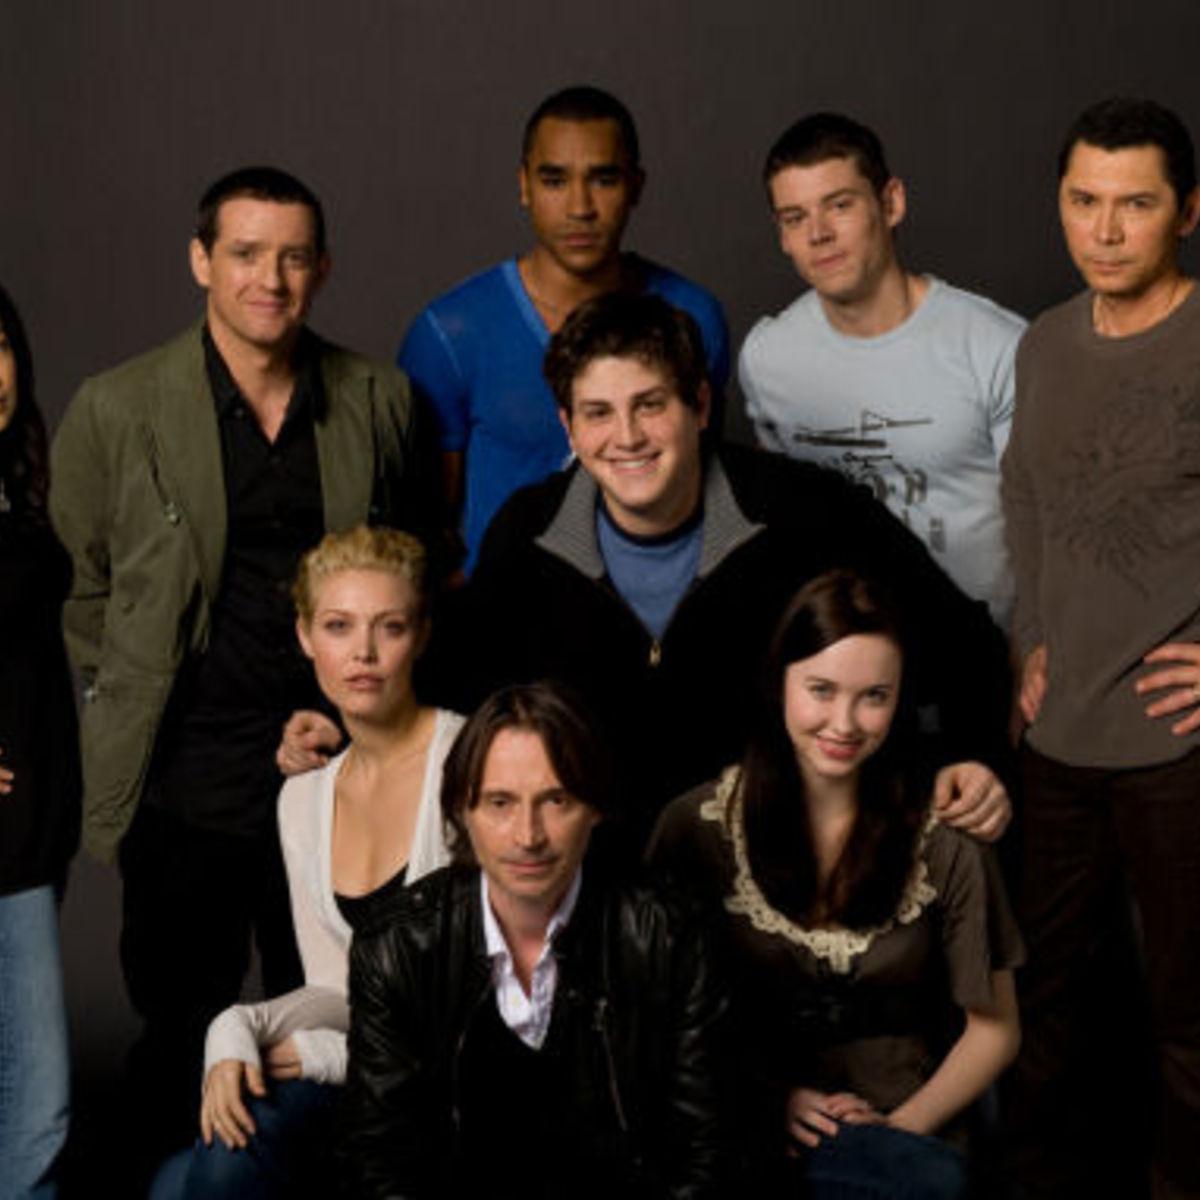 Stargate_universe_cast_2.jpg